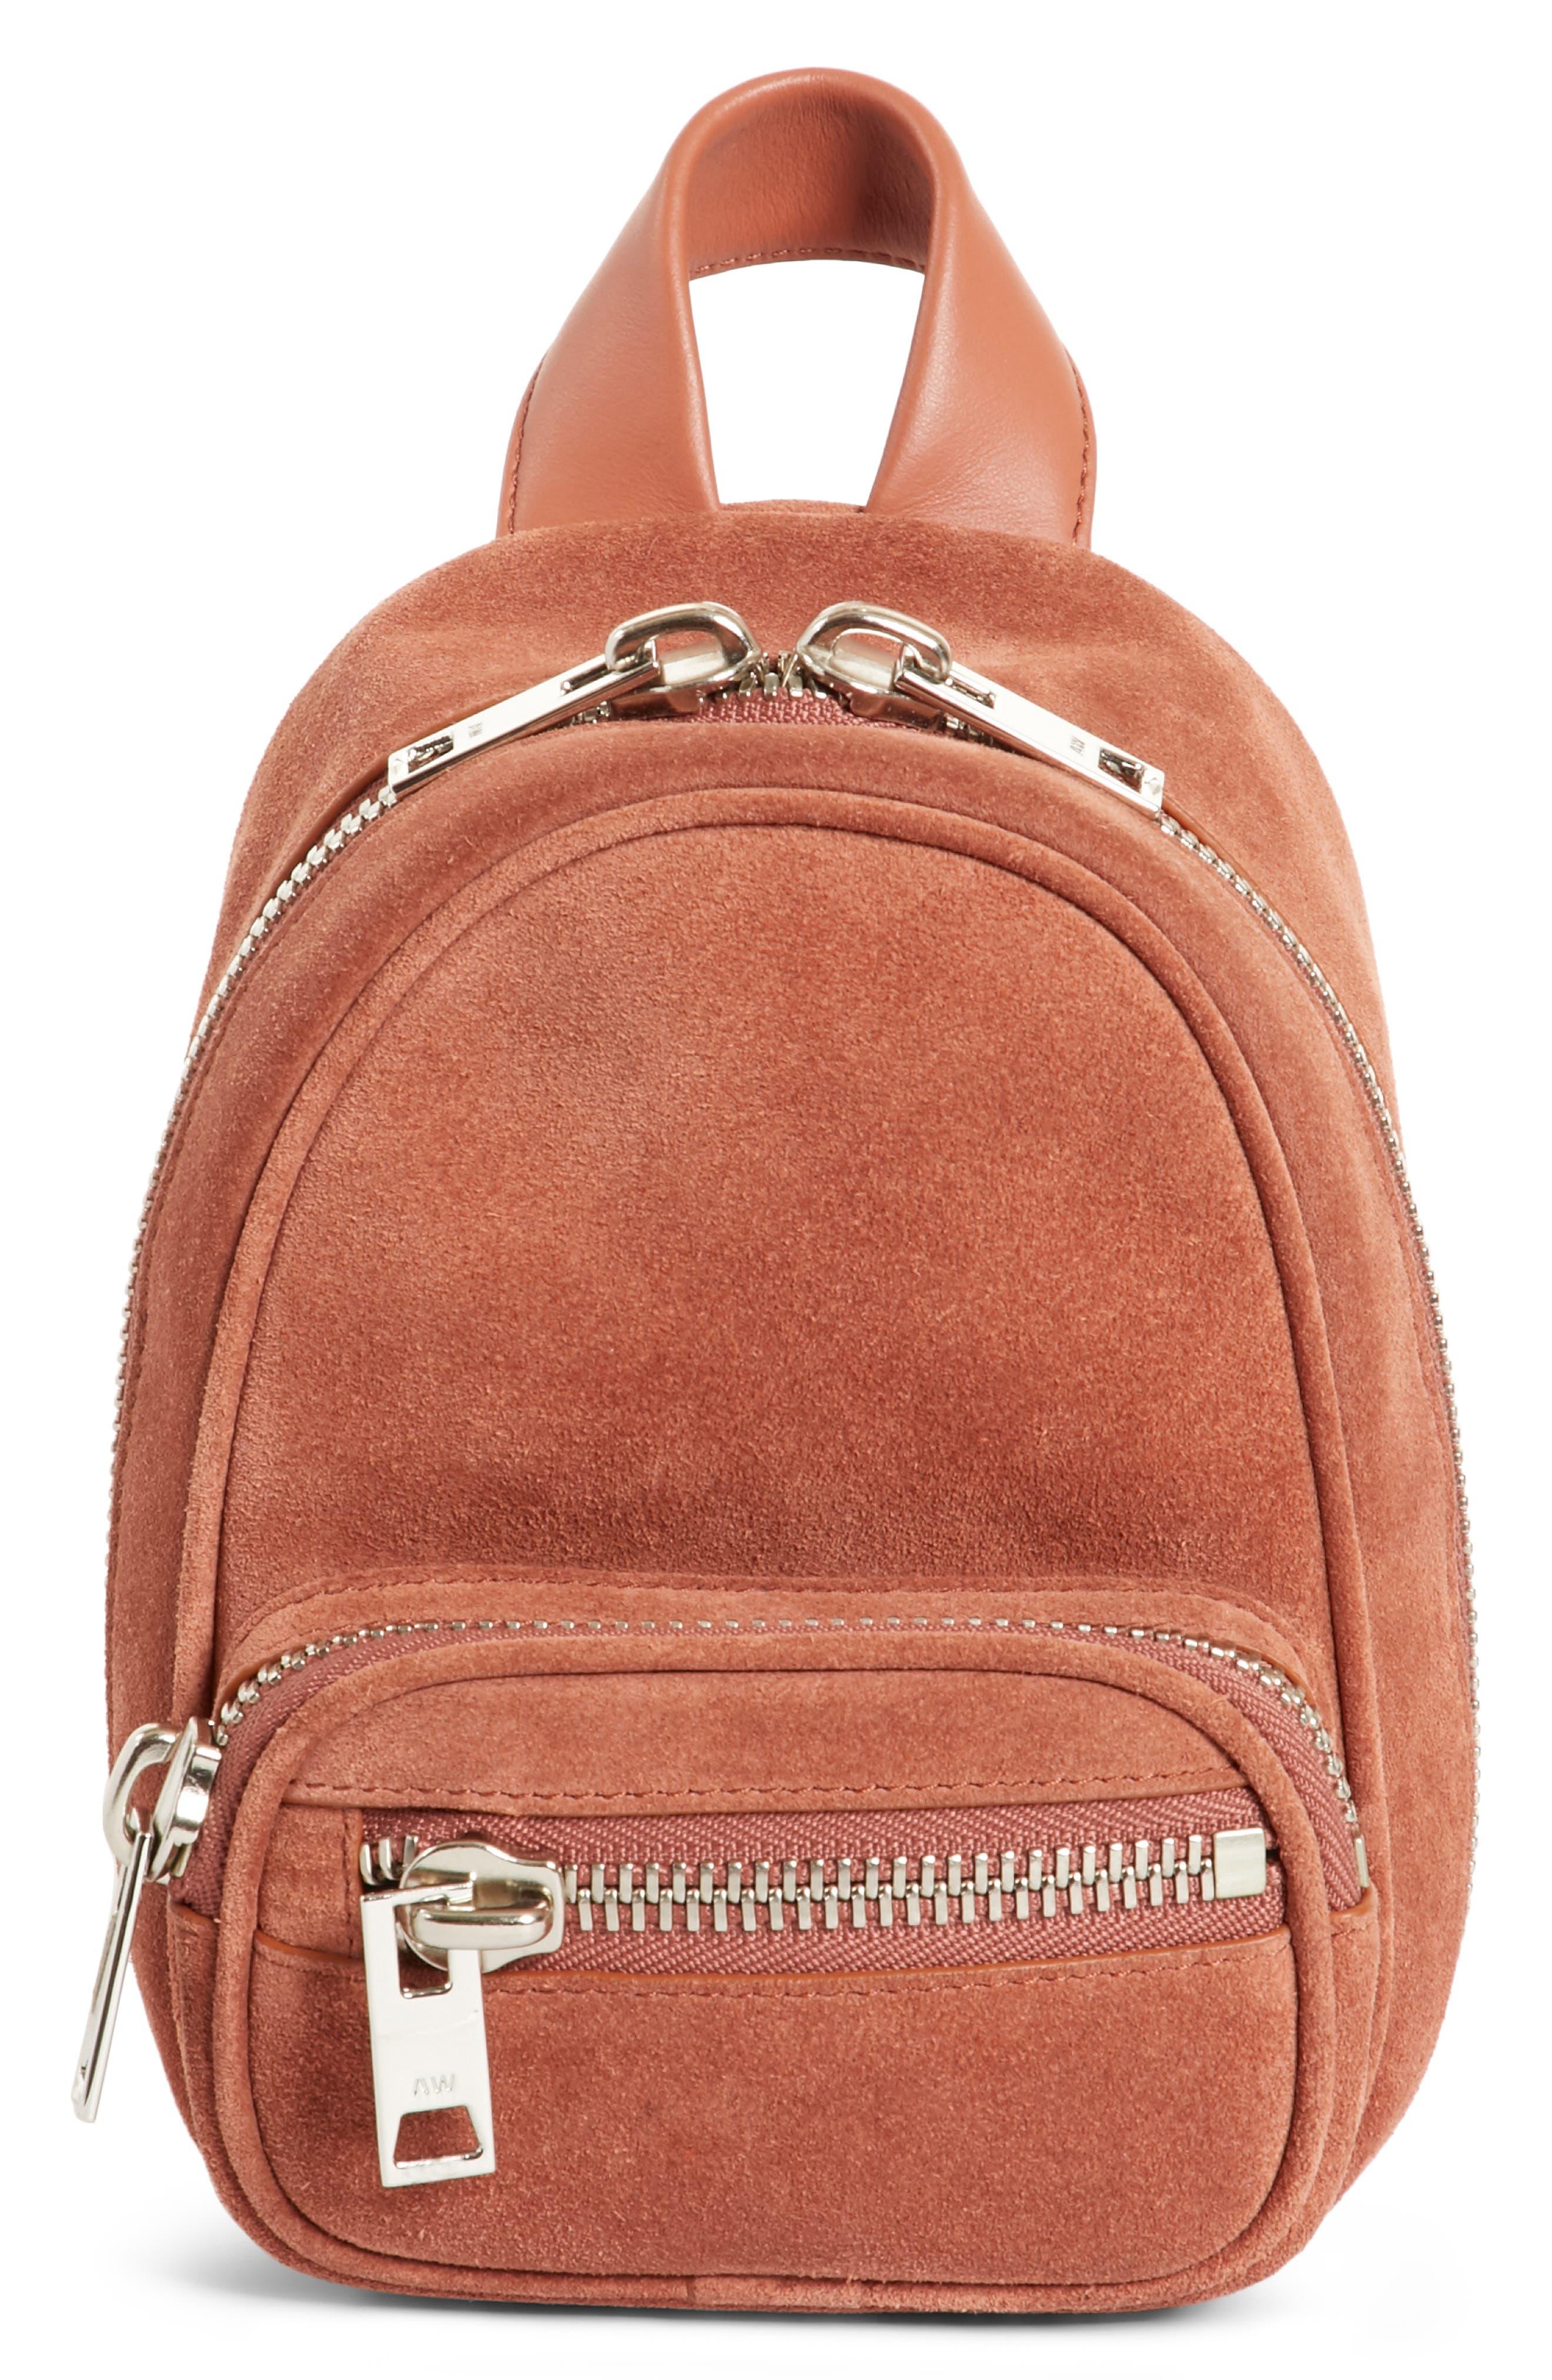 Alternate Image 1 Selected - Alexander Wang Mini Attica Suede Backpack-Shaped Crossbody Bag